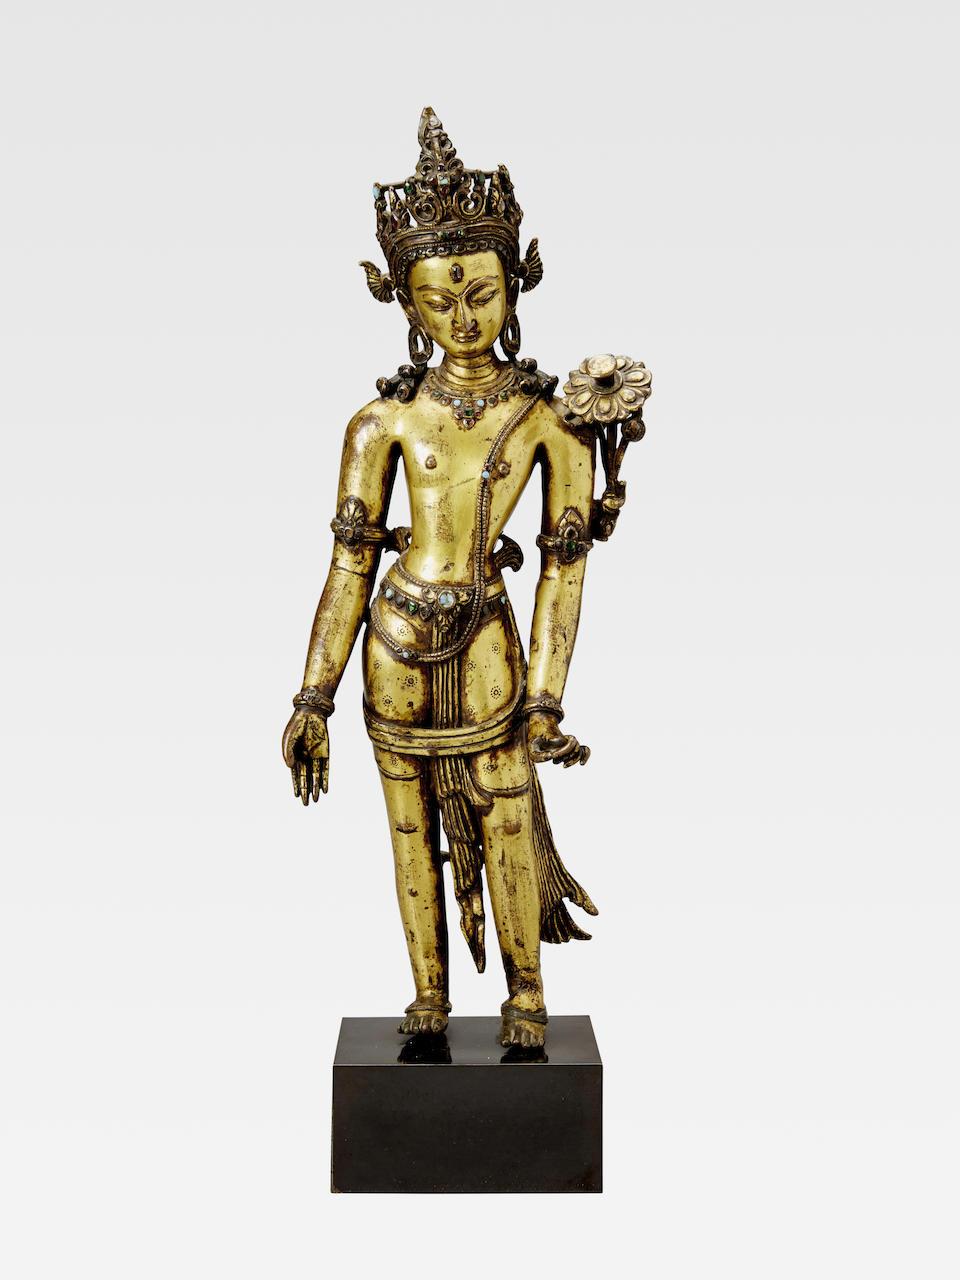 A GILT COPPER ALLOY FIGURE OF PADMAPANI LOKESHVARA NEPAL, 13TH/14TH CENTURY